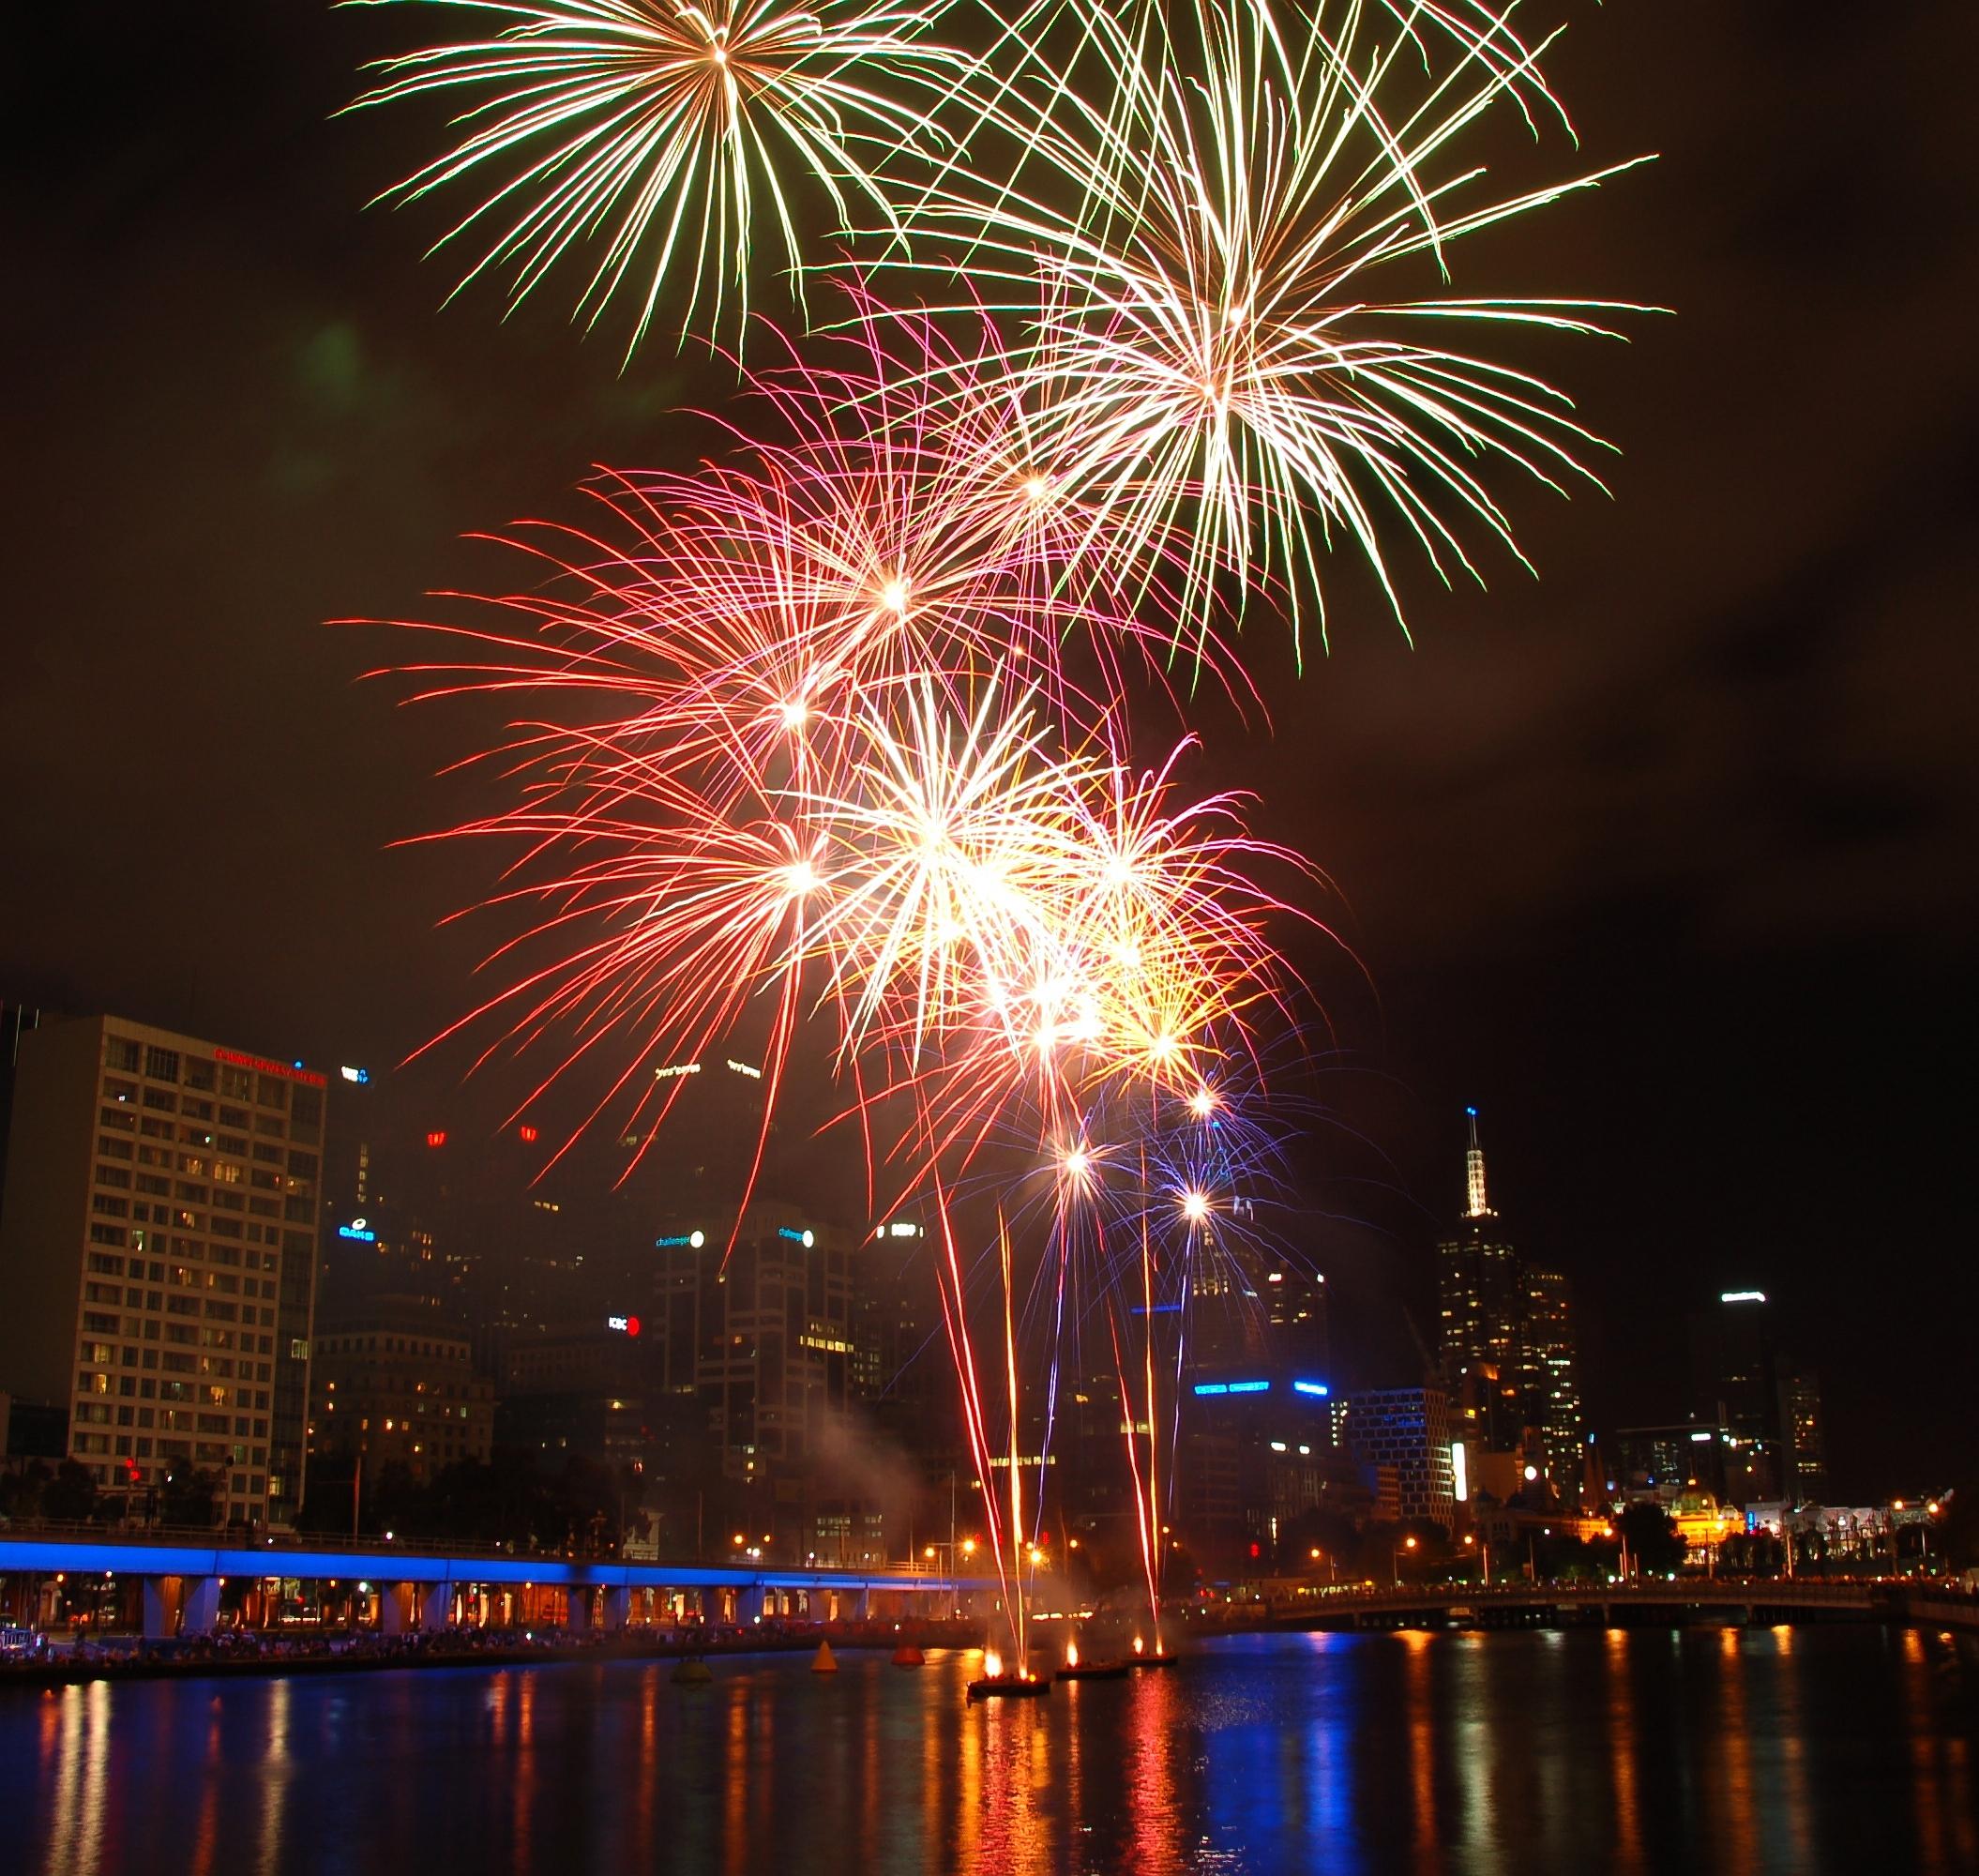 filesnake like celebrating chinese lunar new year 2013